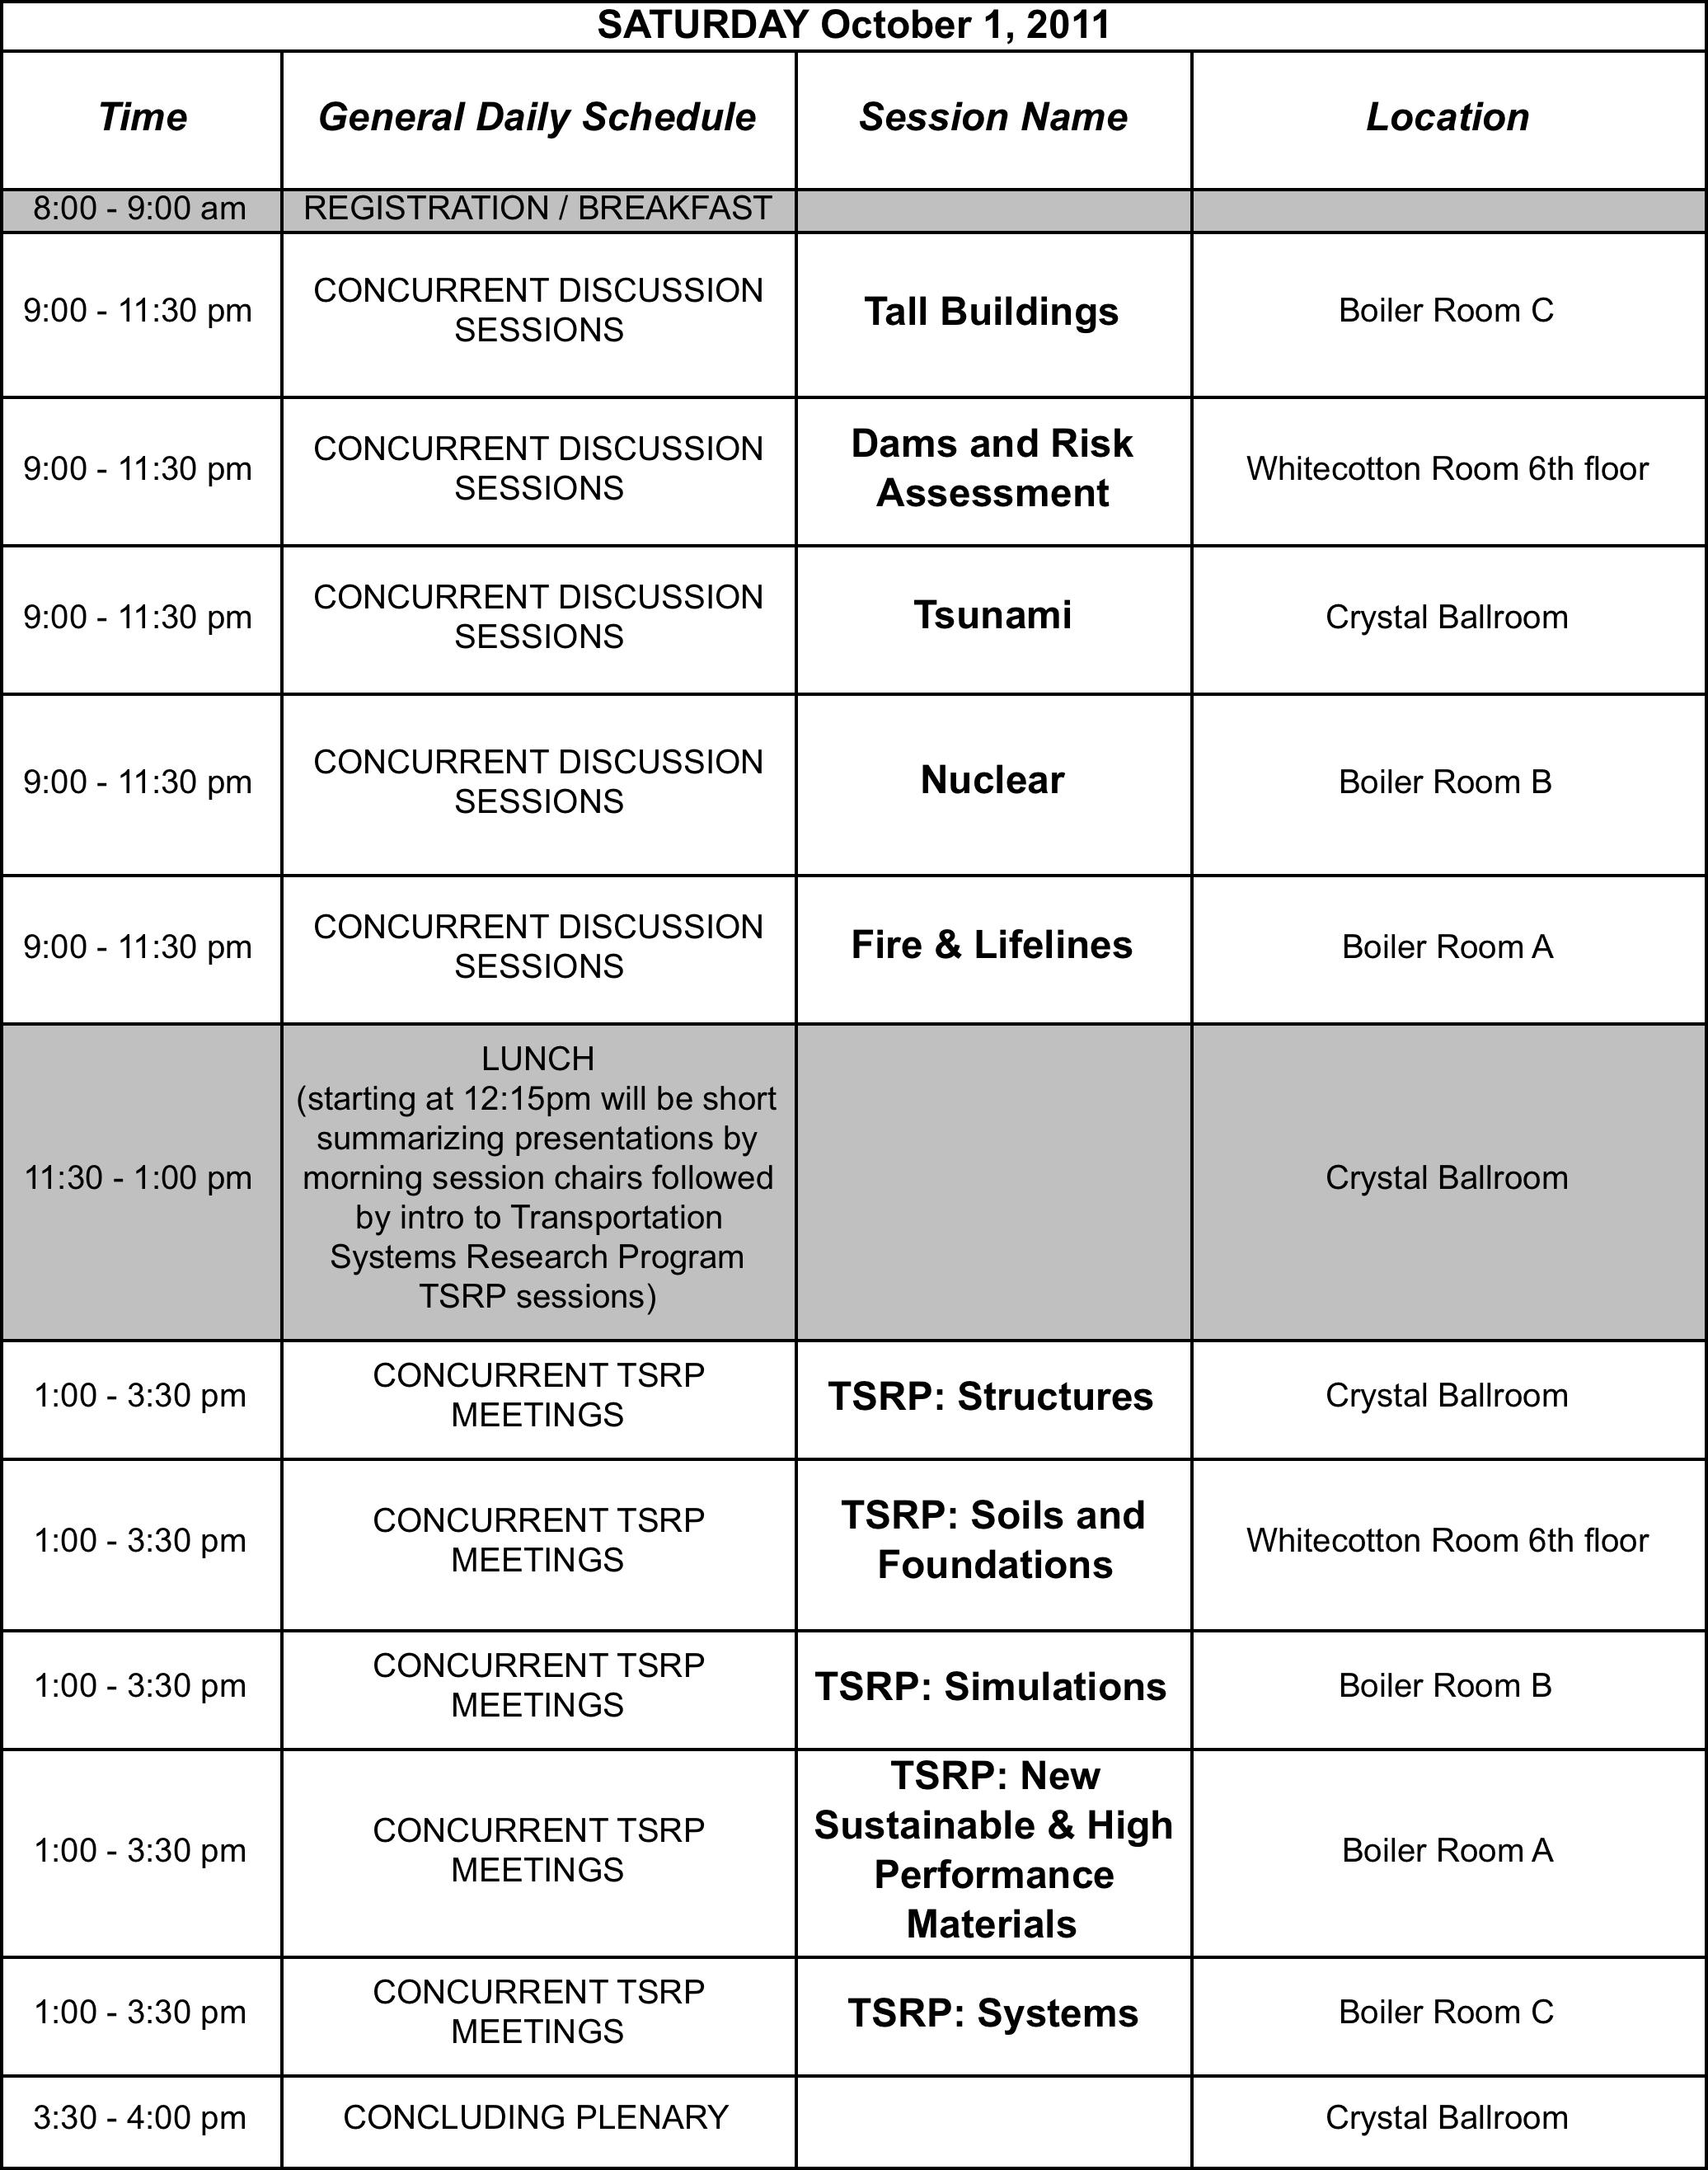 2011 PEER Annual Meeting Saturday Program